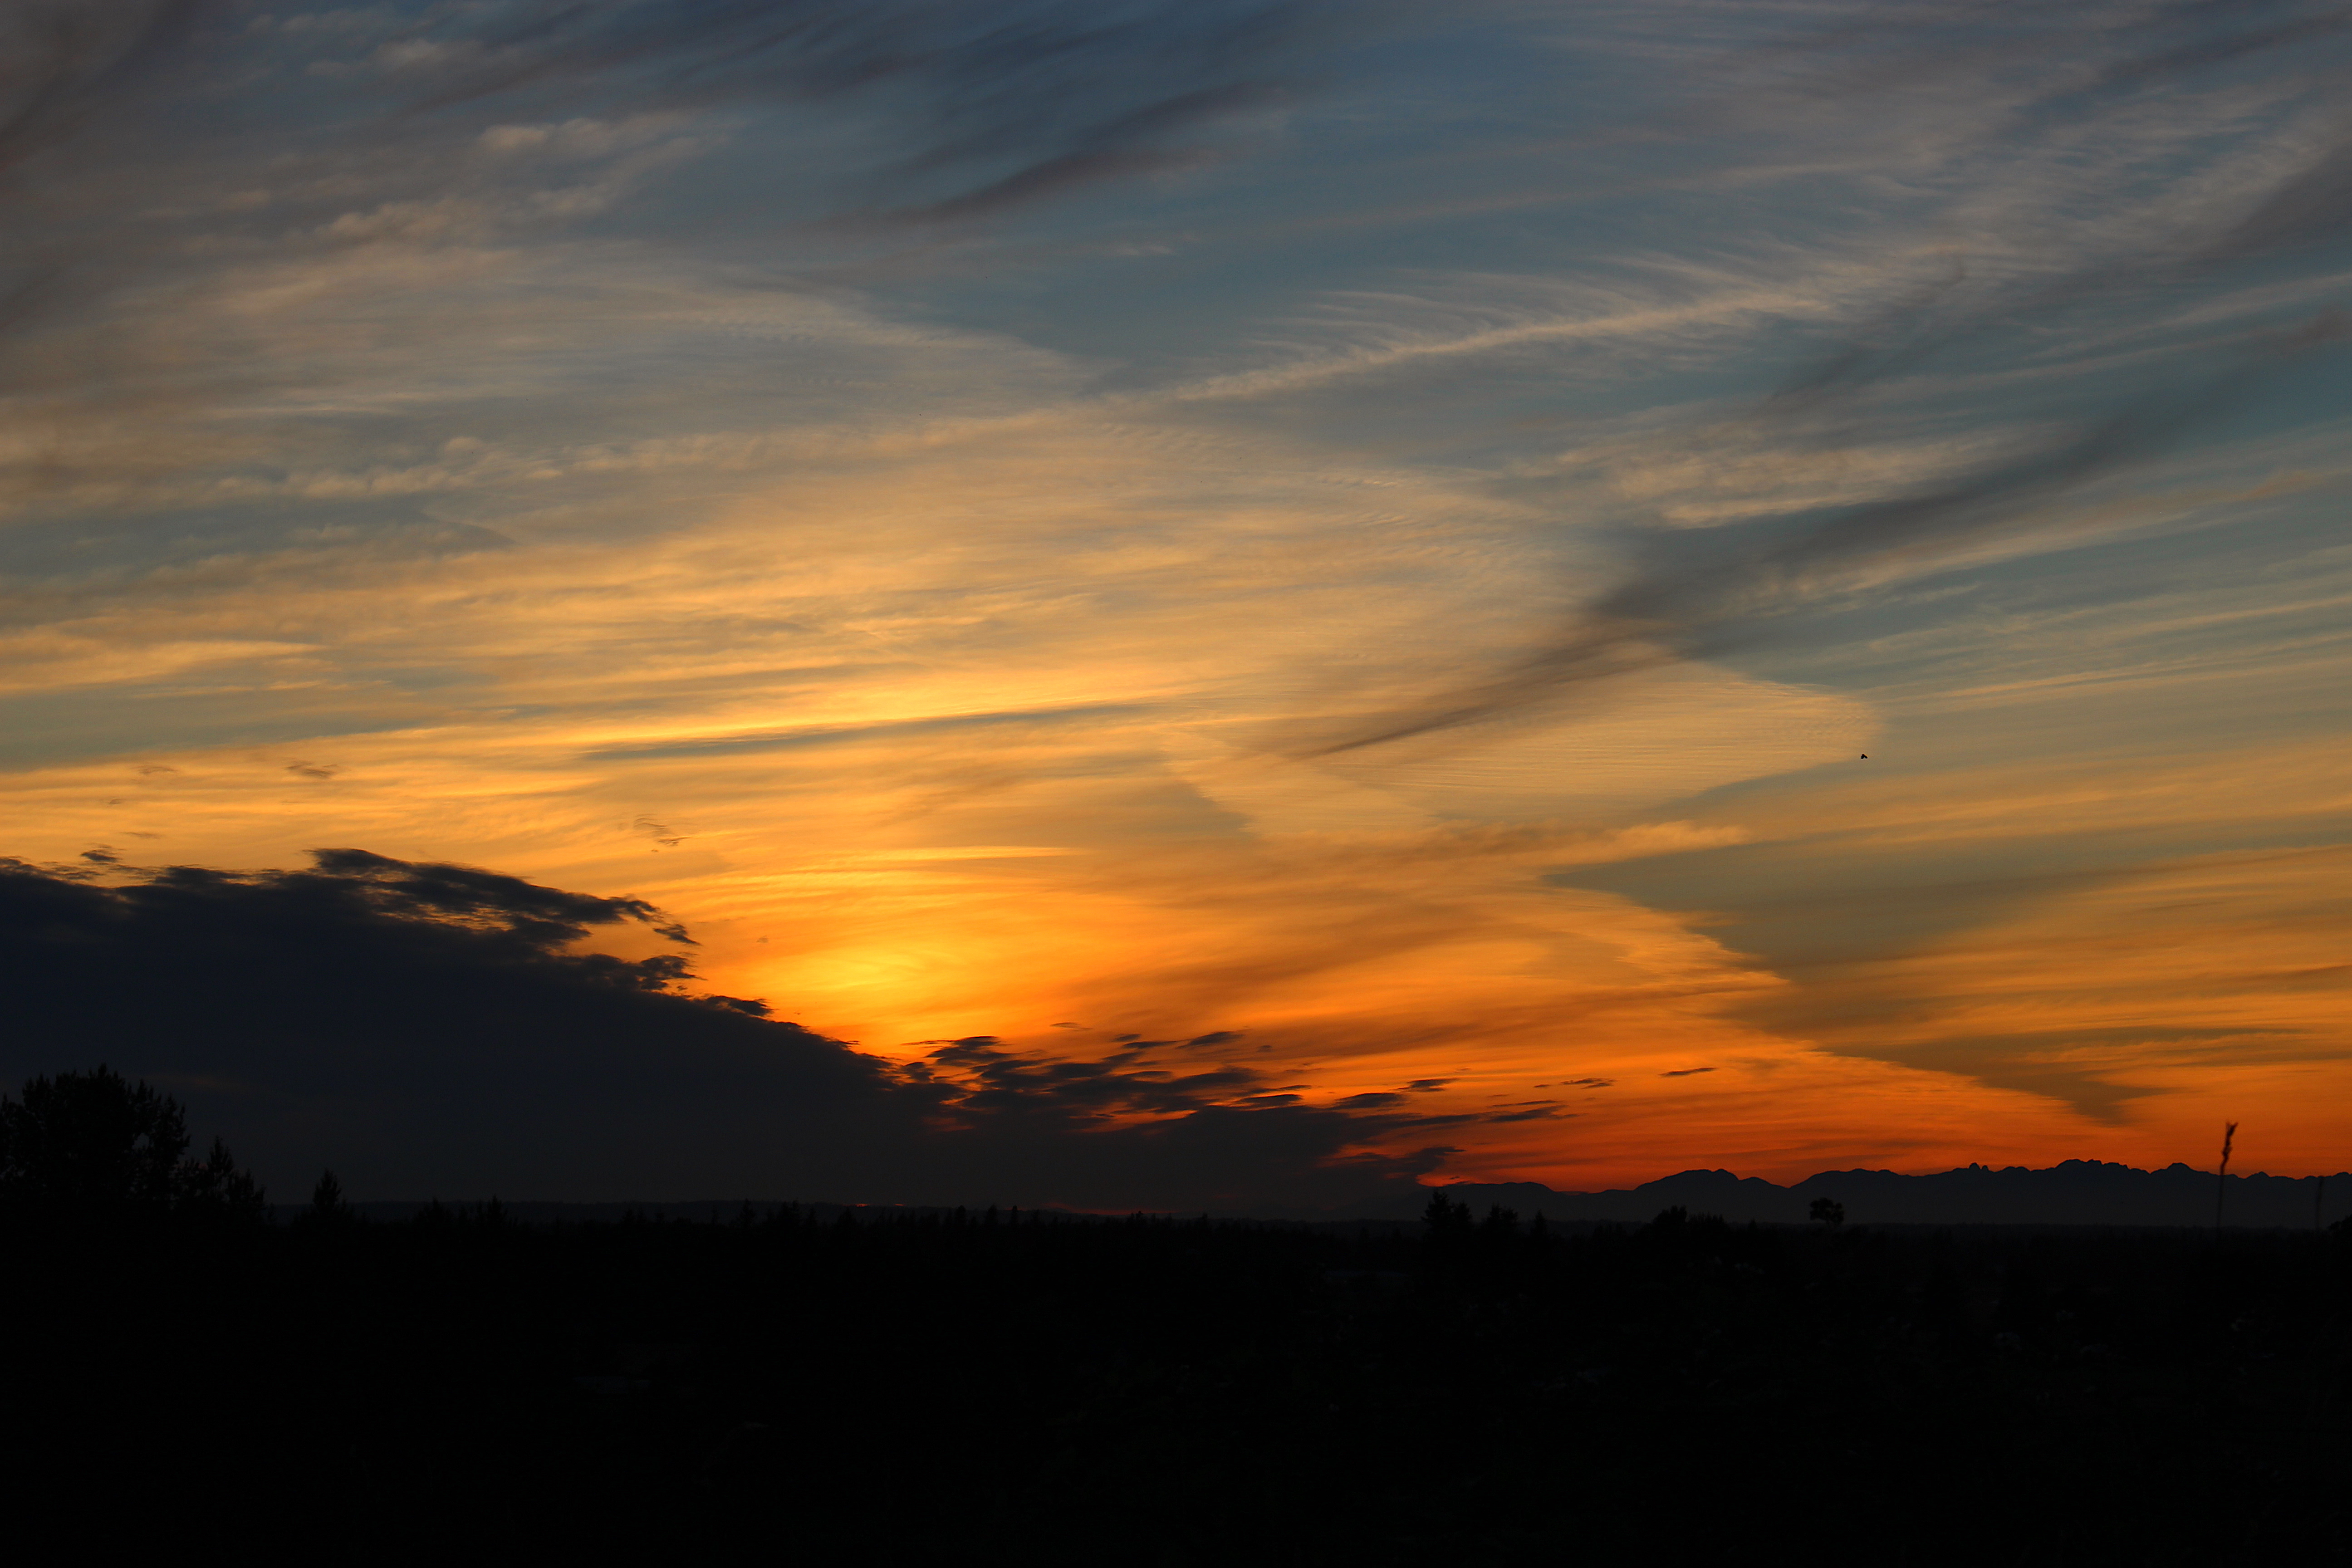 sunset823151